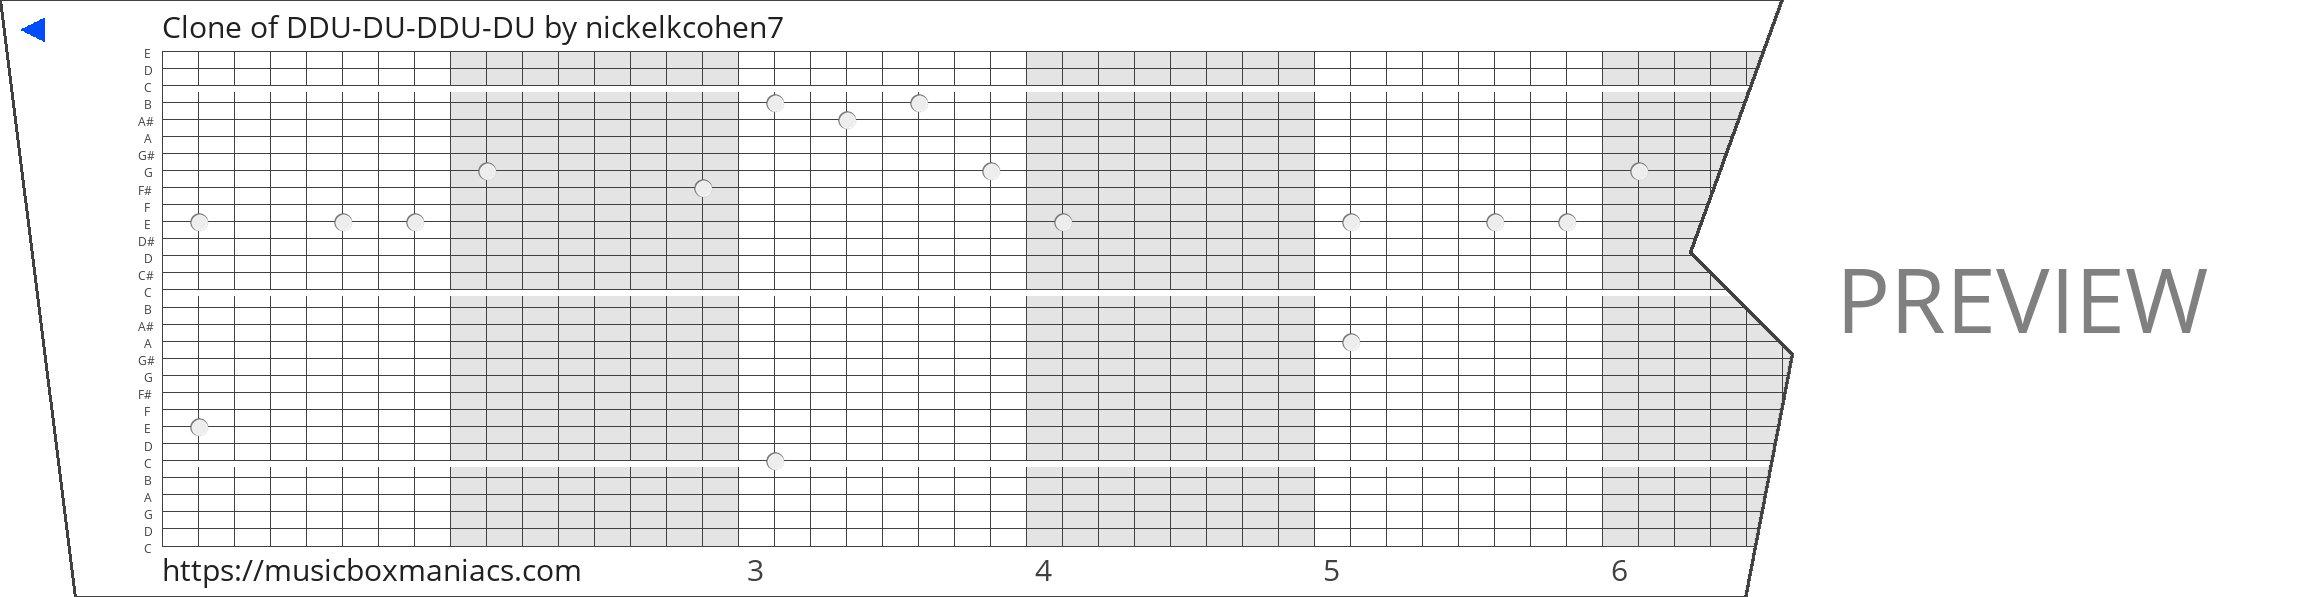 Clone of DDU-DU-DDU-DU 30 note music box paper strip